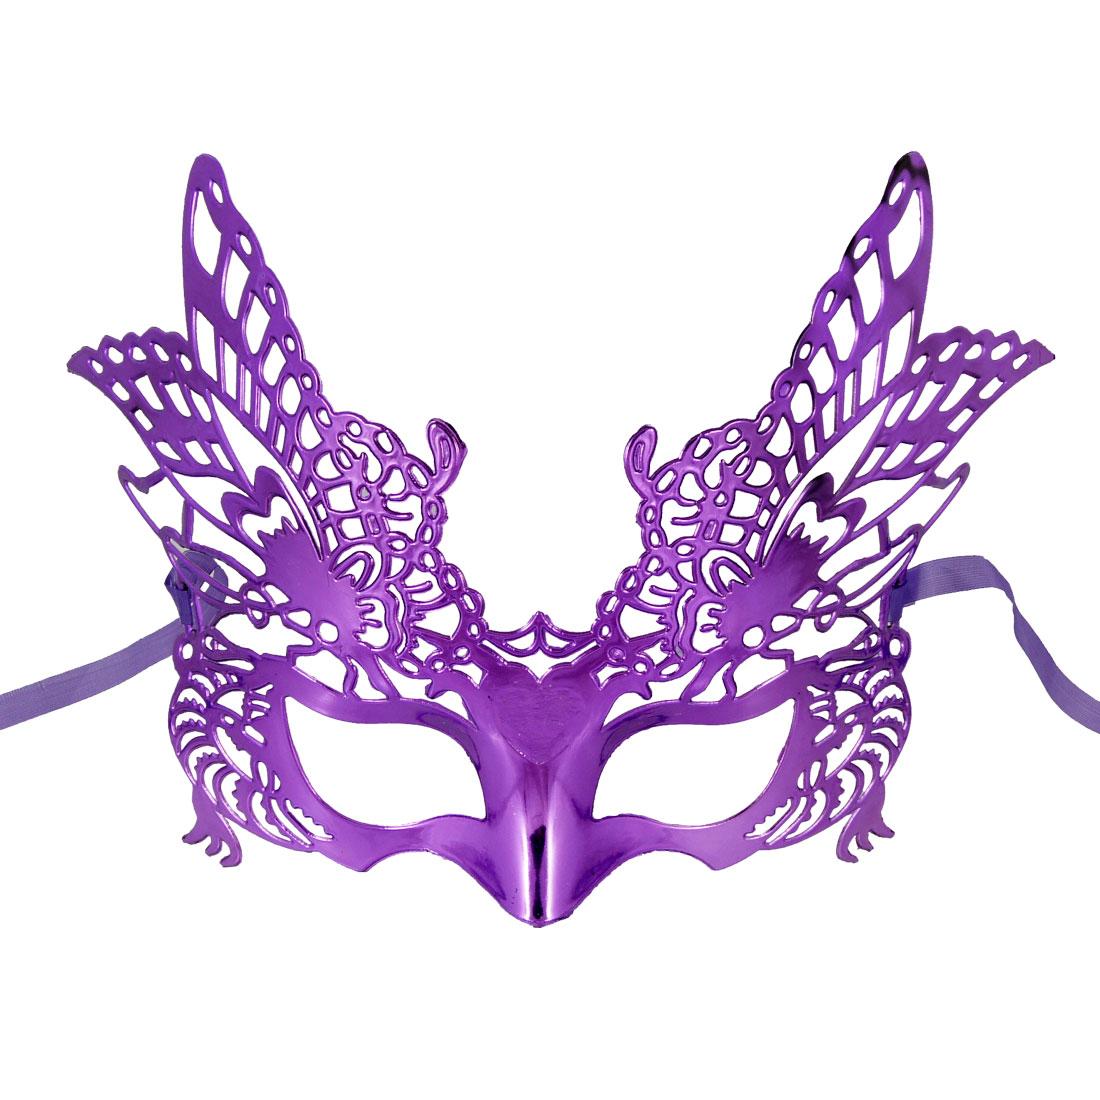 1100x1100 Masquerade Mask Clip Art Many Interesting Cliparts